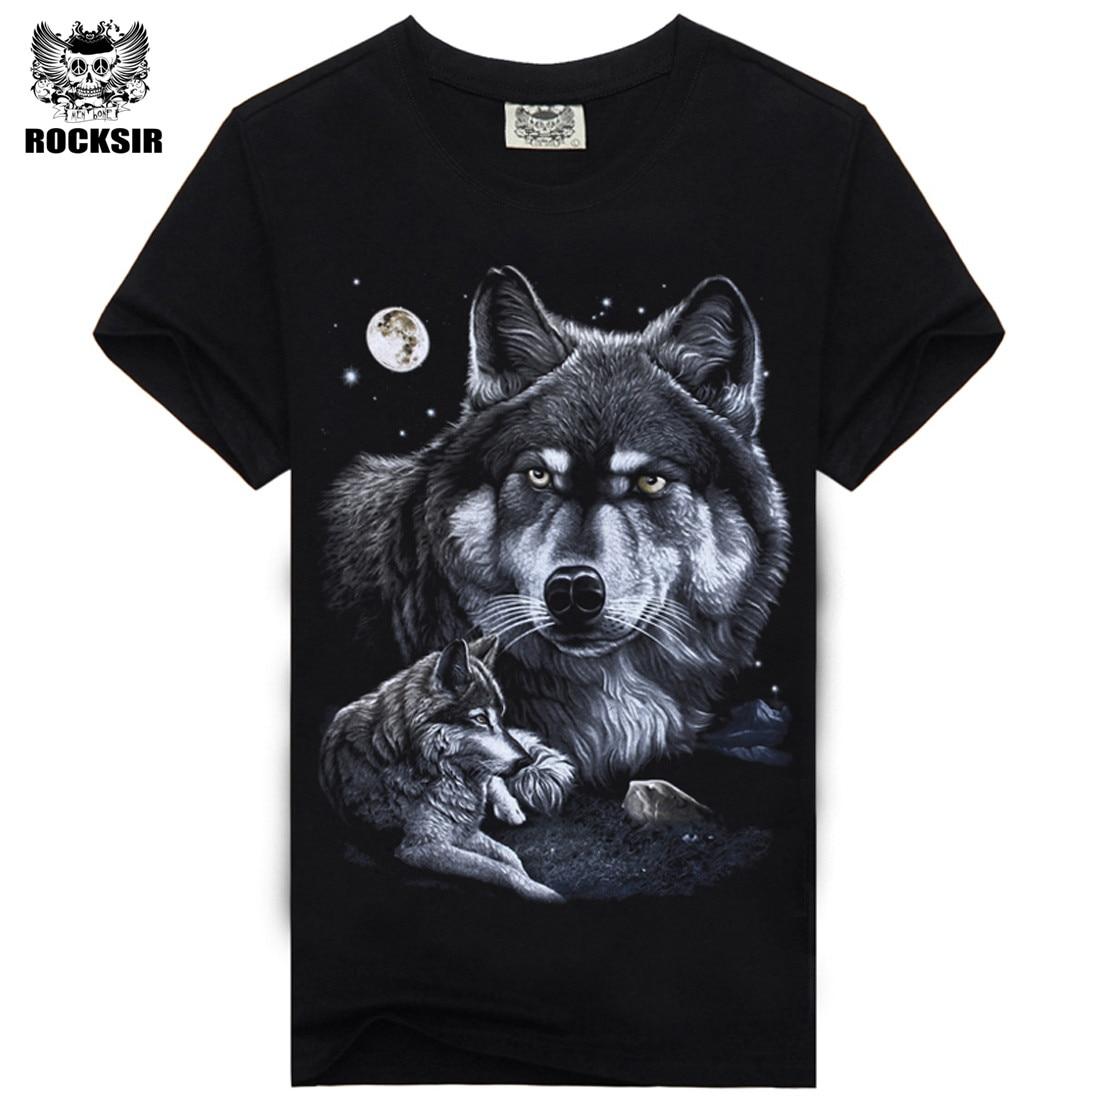 HTB1b8SVSpXXXXcCXVXXq6xXFXXX3 - Rocksir 3d wolf t shirt Indians wolf t shirts boyfriend gift ideas